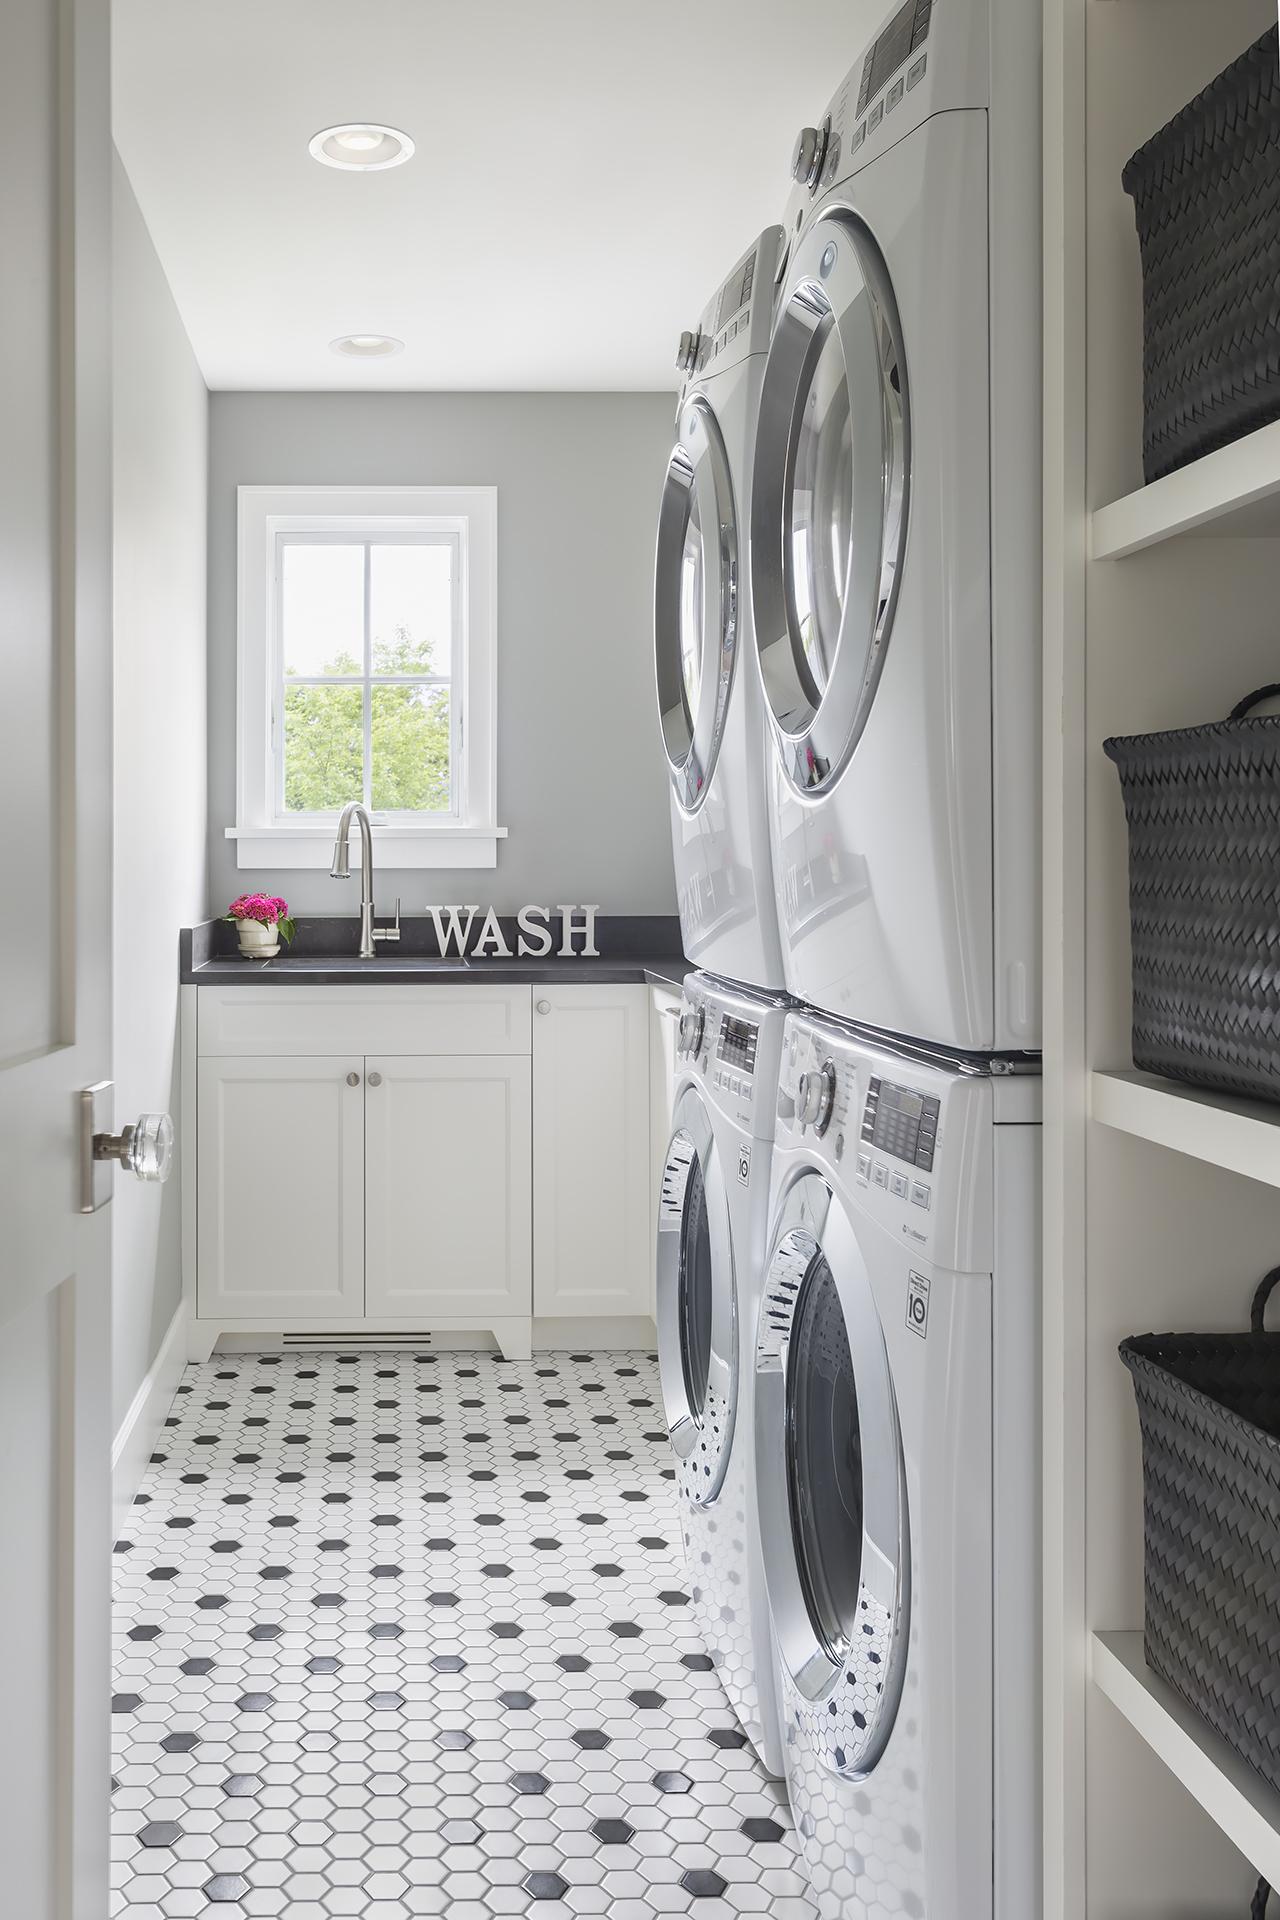 LaundryRoom_2018_05_23.jpg